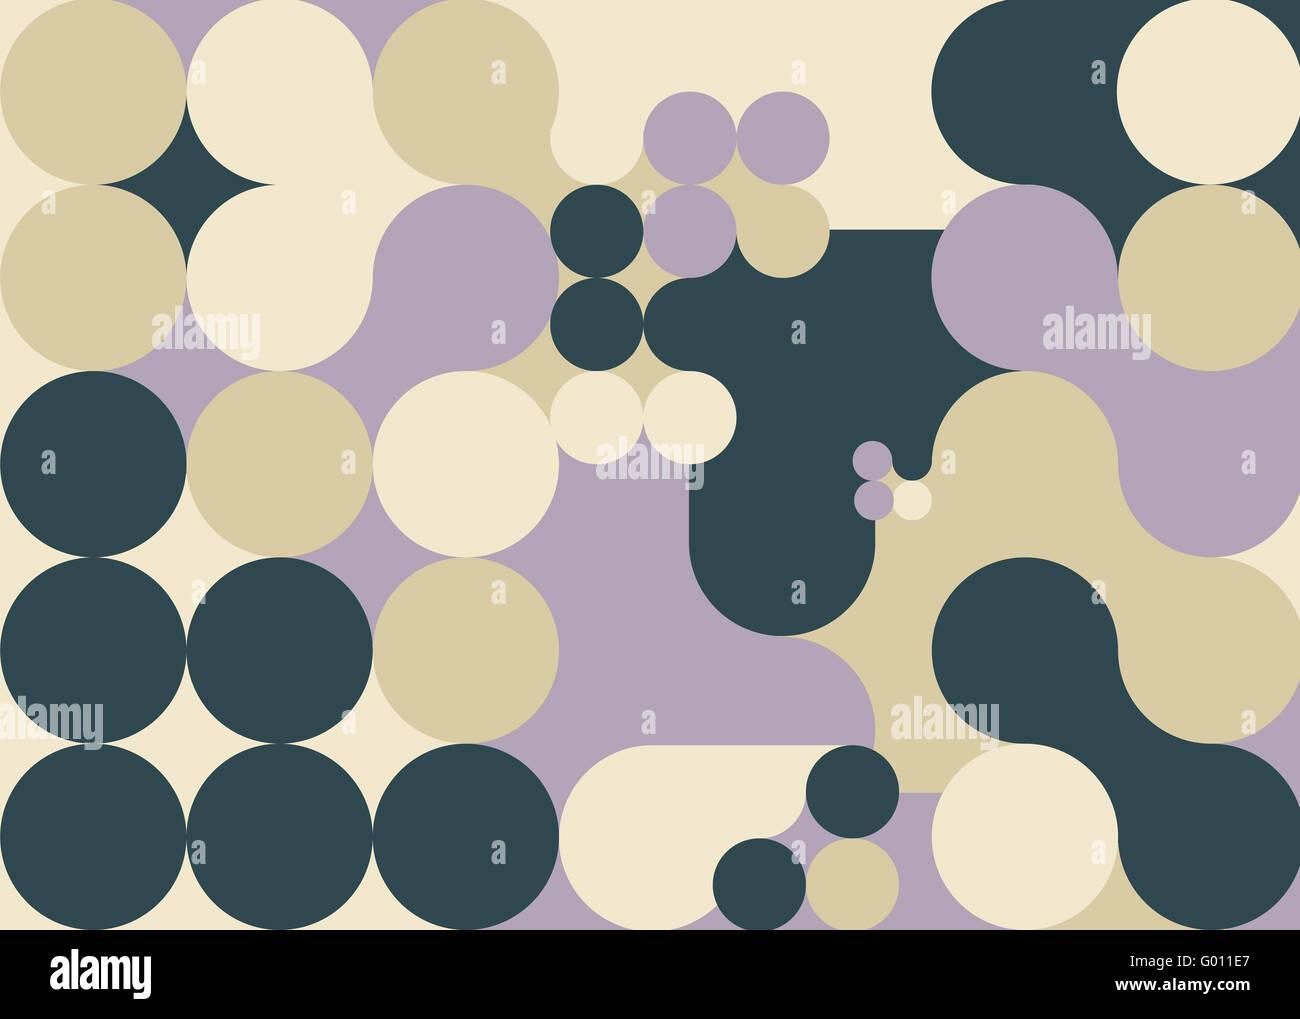 Ball Texture - Stock Image